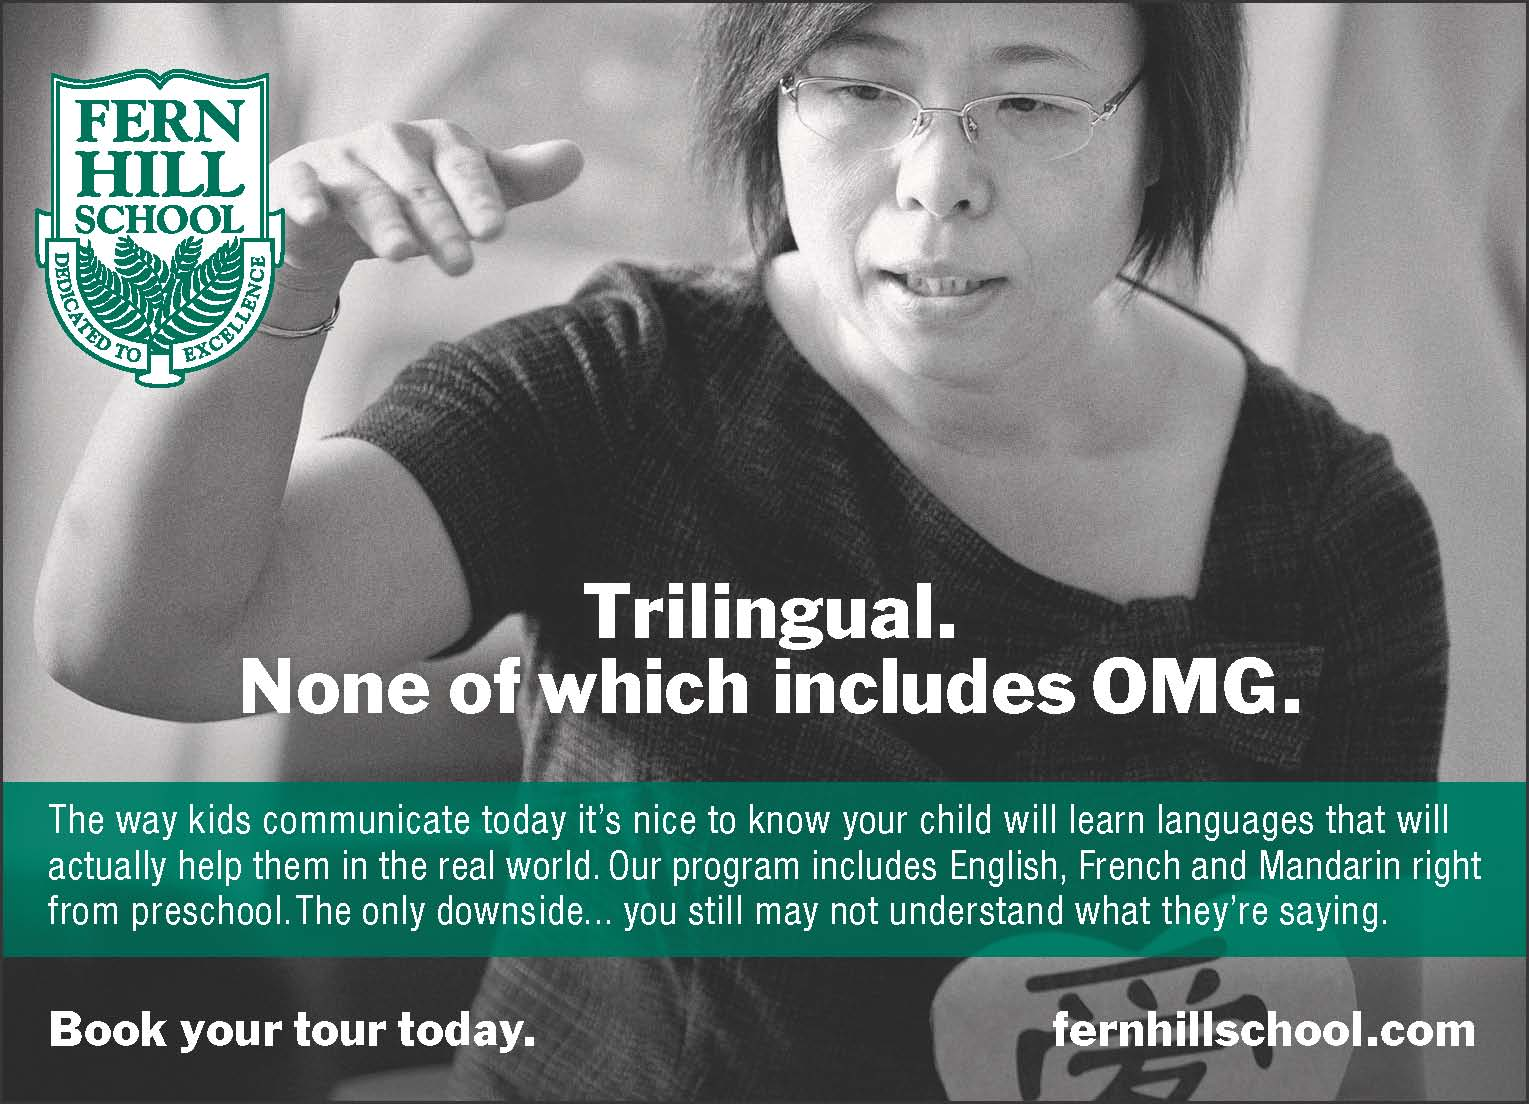 Fern Hill _Trilingual_ ad.jpg